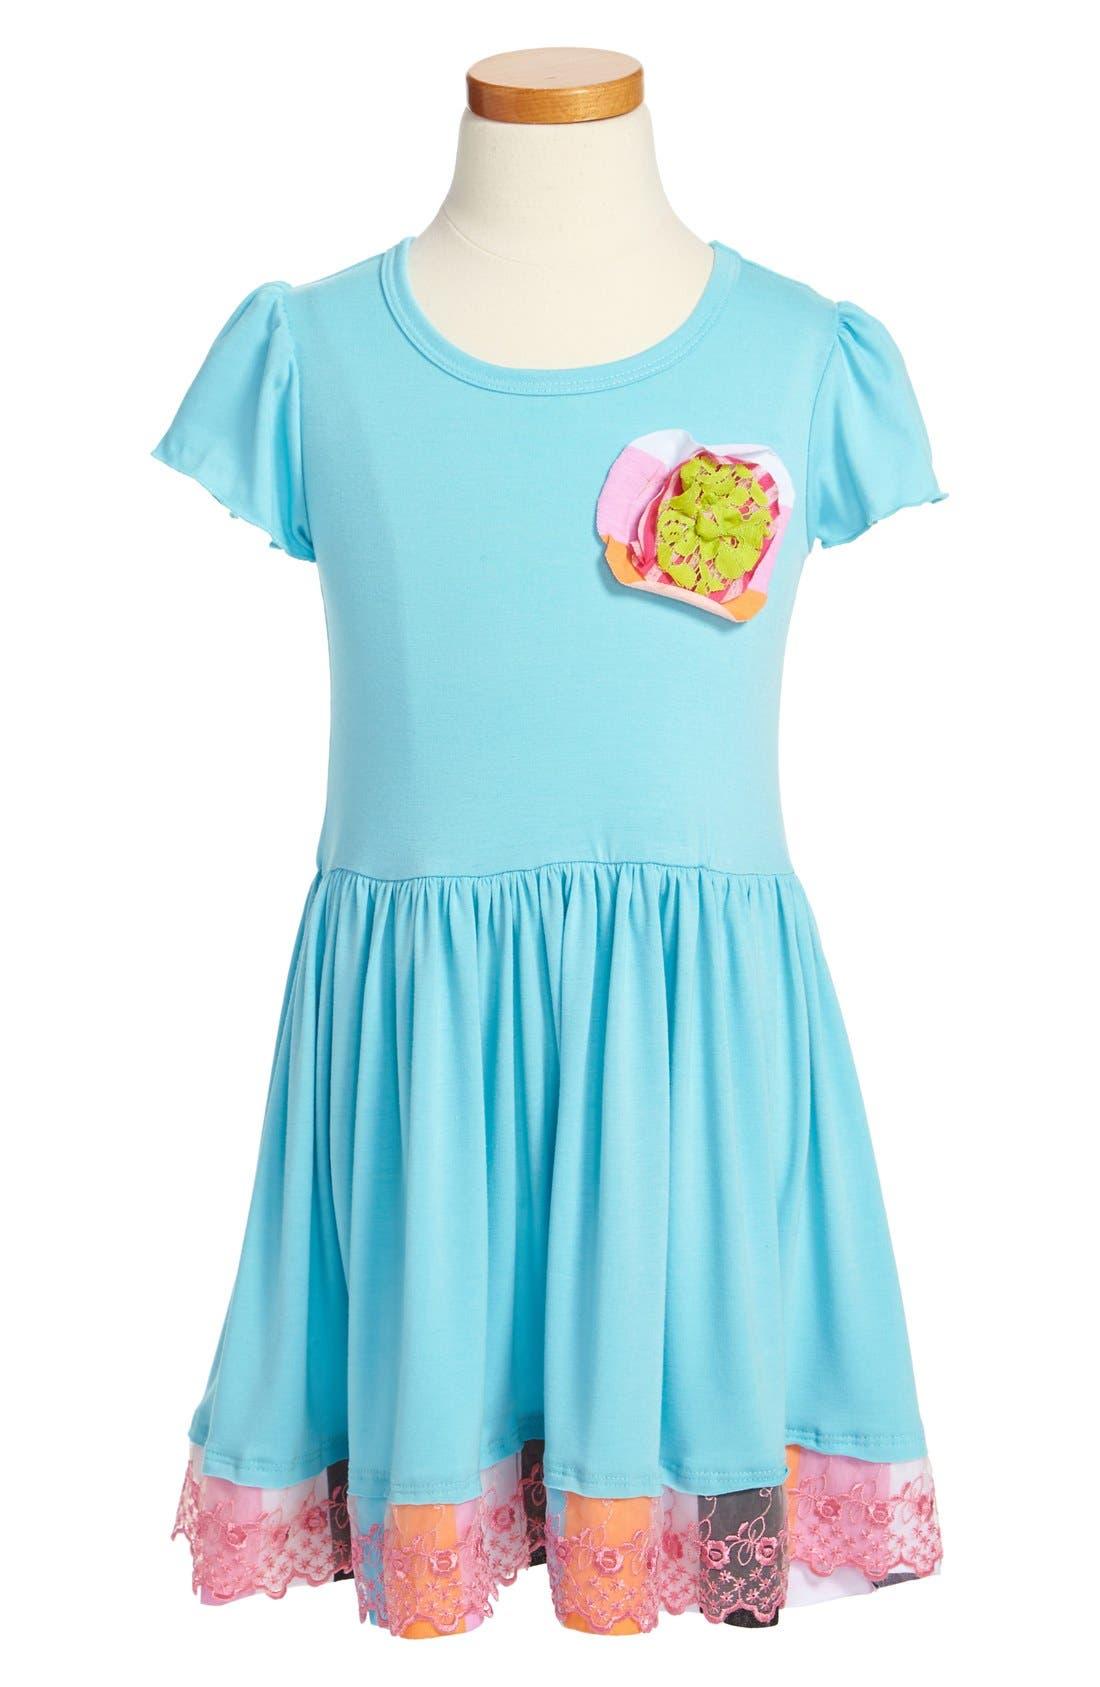 Alternate Image 1 Selected - Twirls & Twigs Contrast Ruffle Dress (Little Girls & Big Girls)